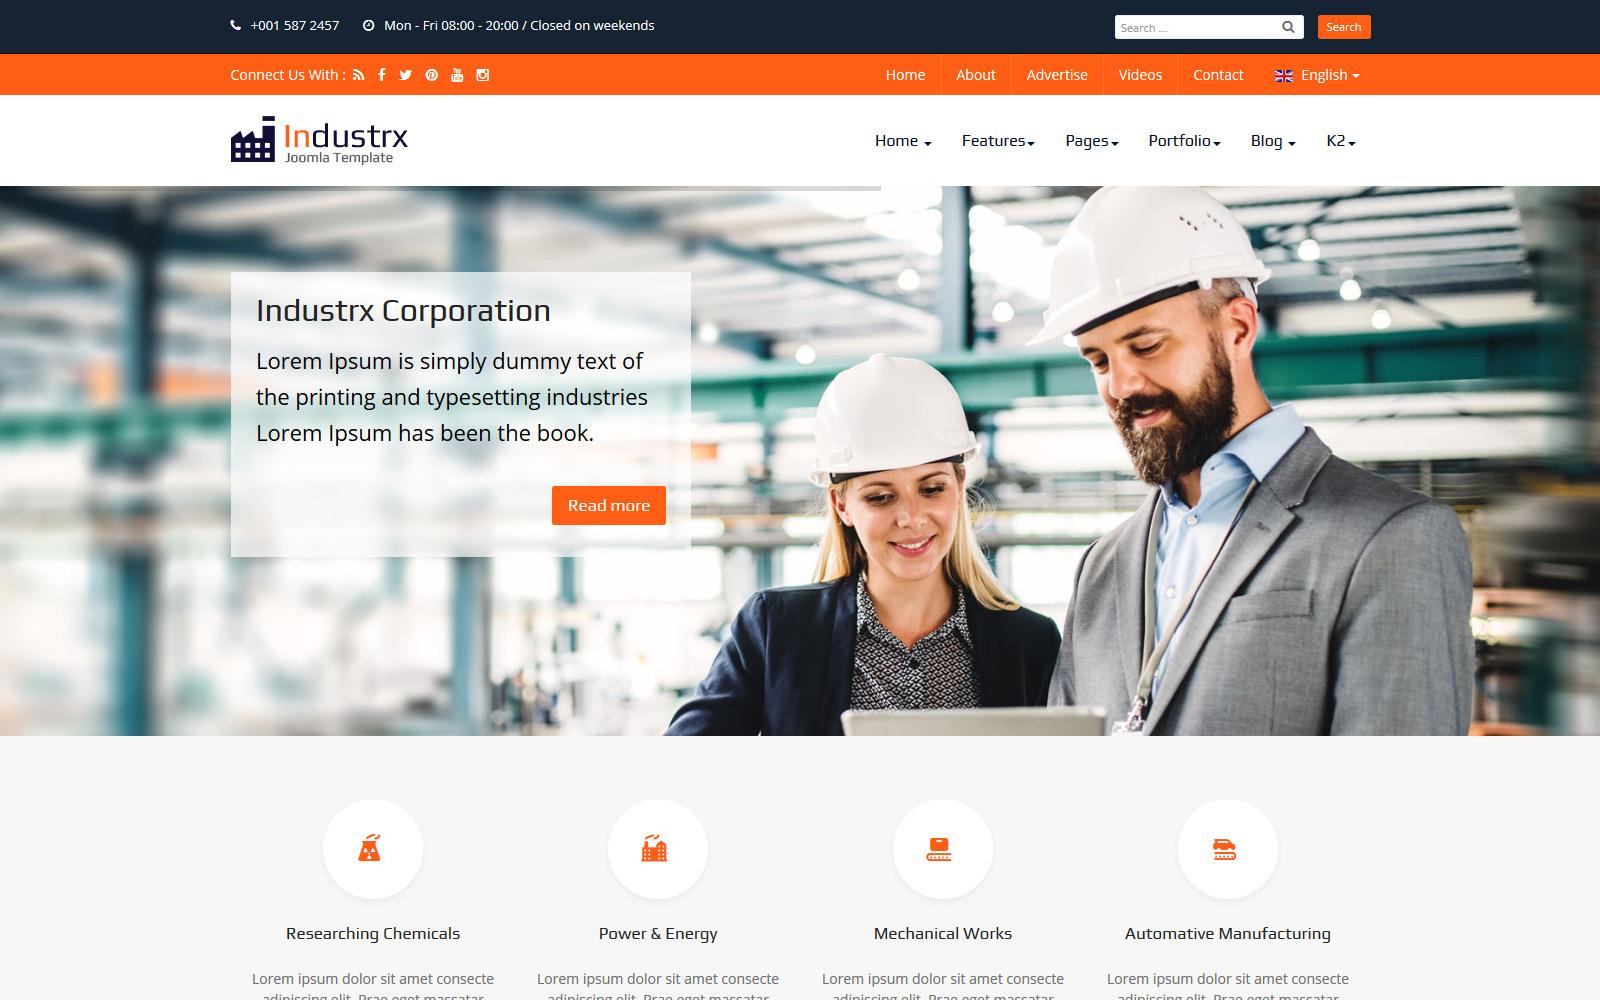 Industrx Business-Industry Template Joomla №102884